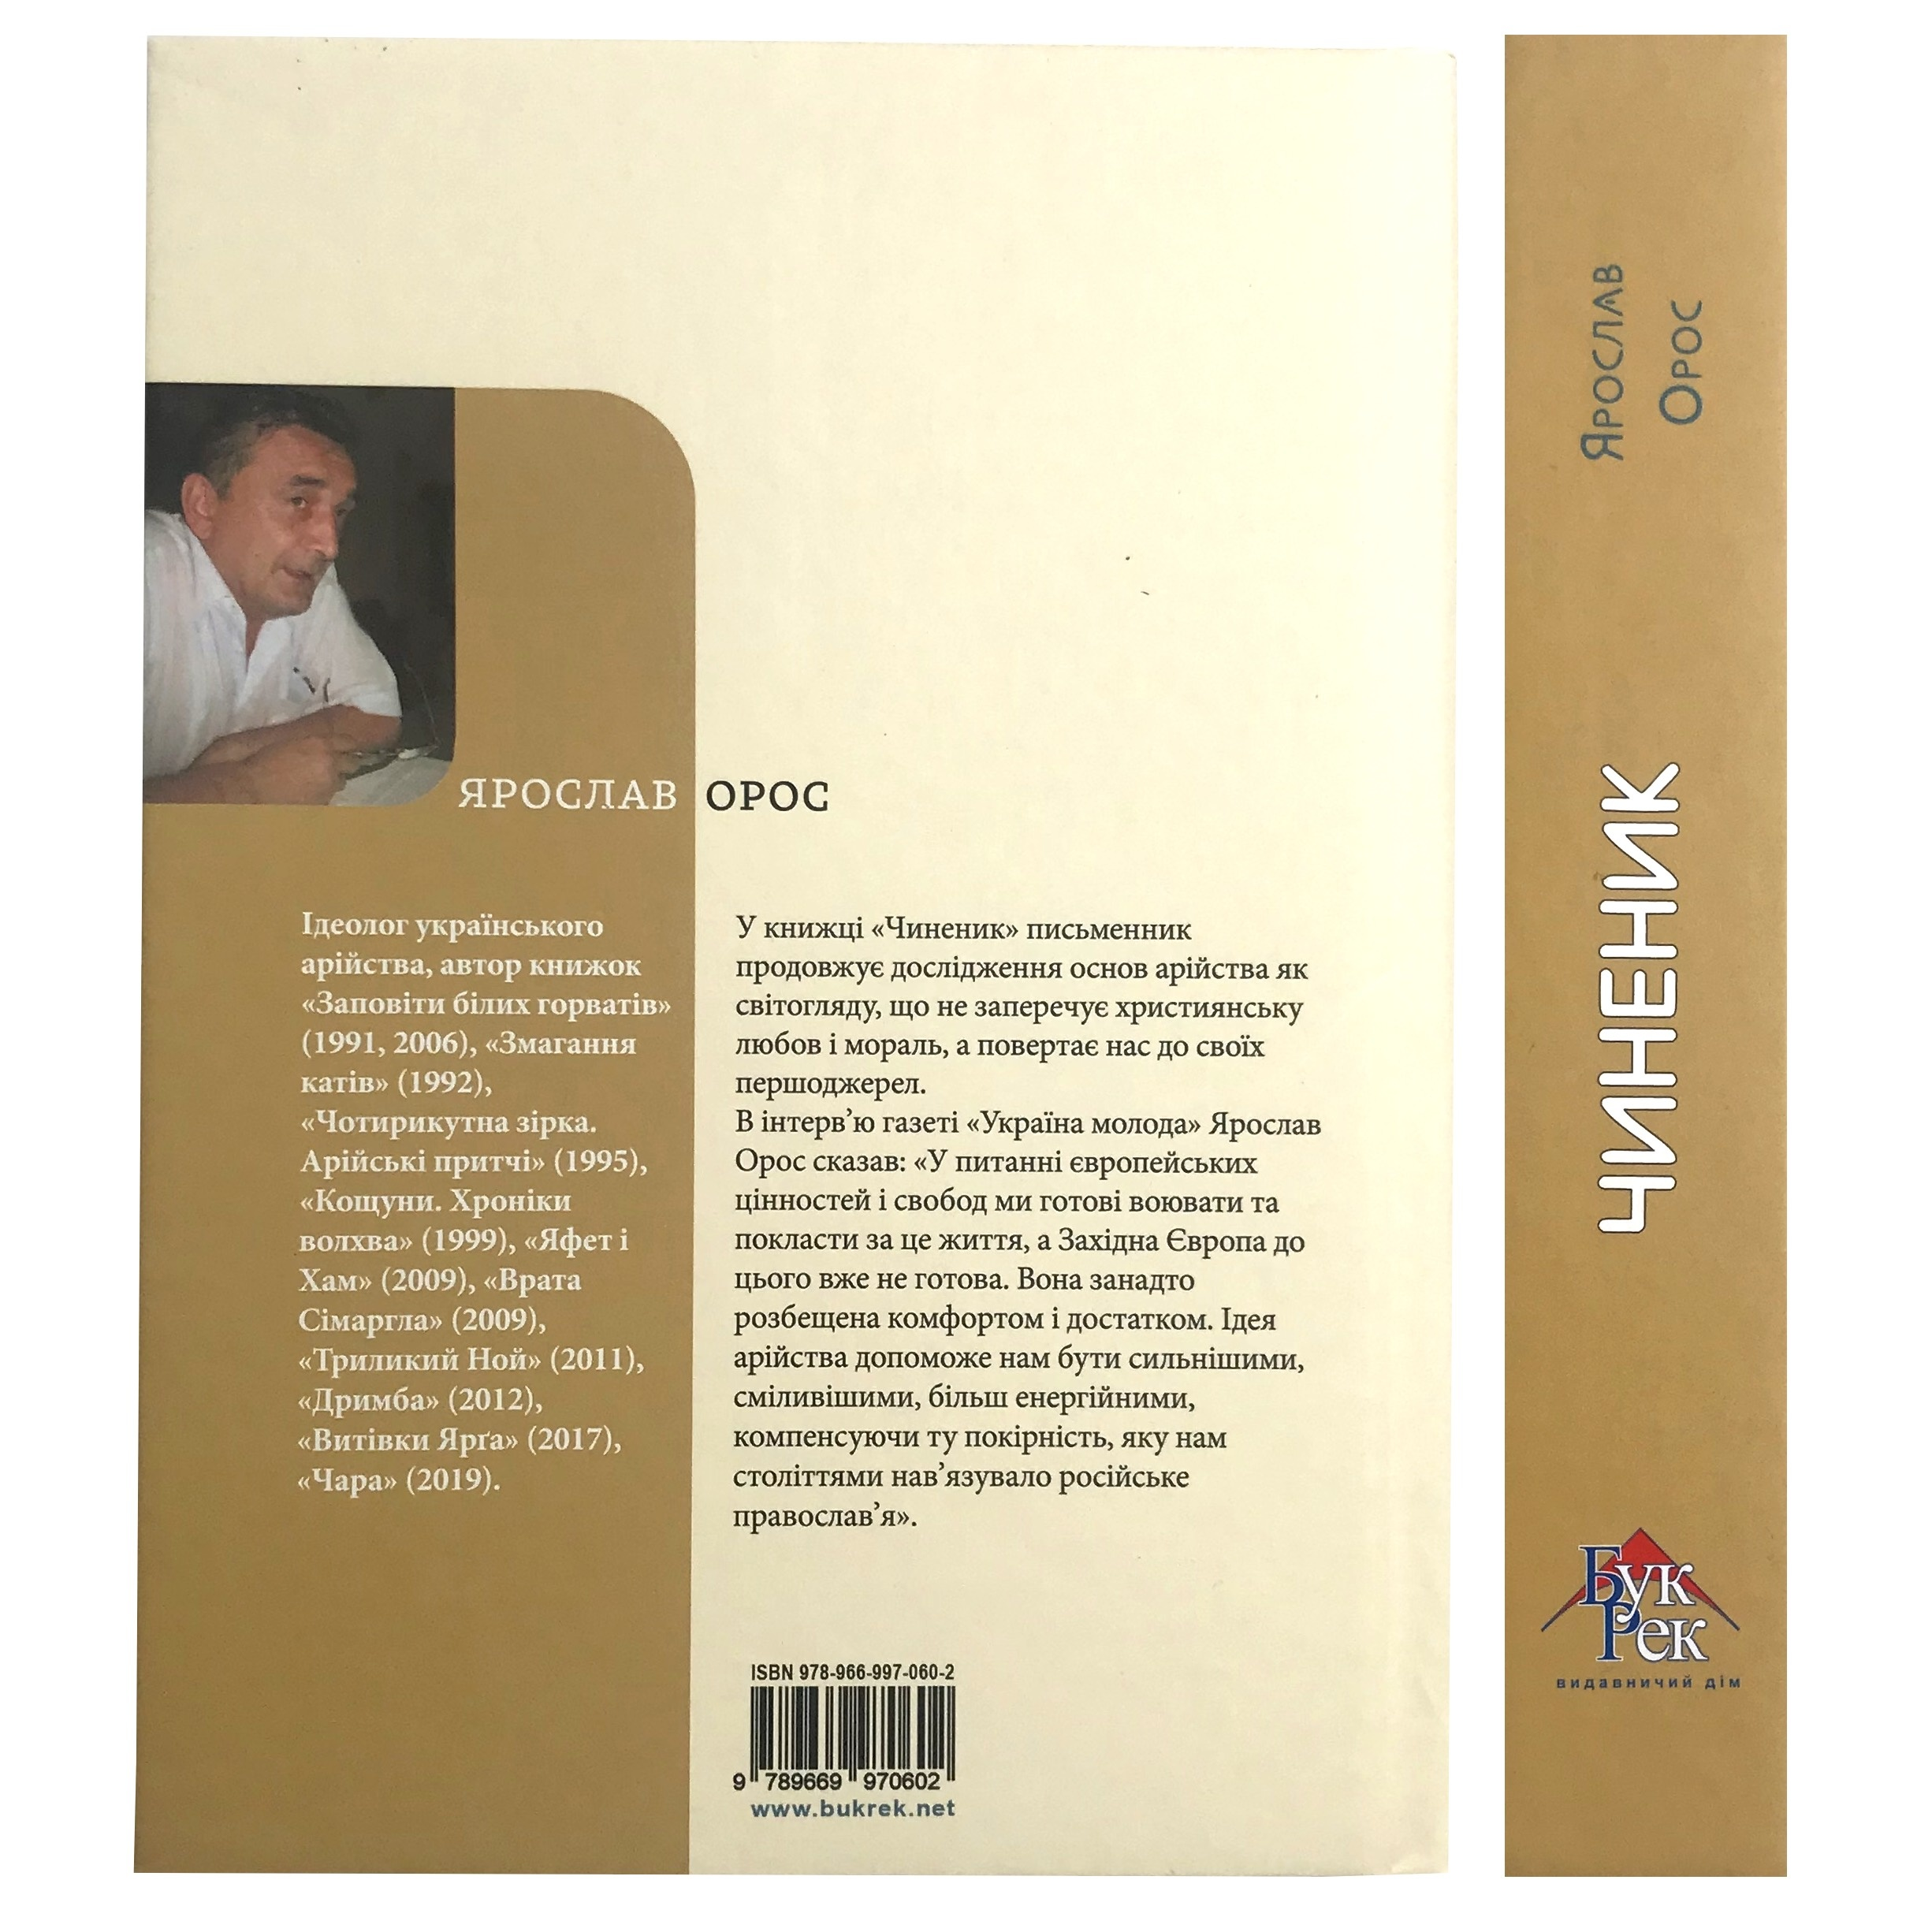 Чиненик. Автор — Ярослав Орос.